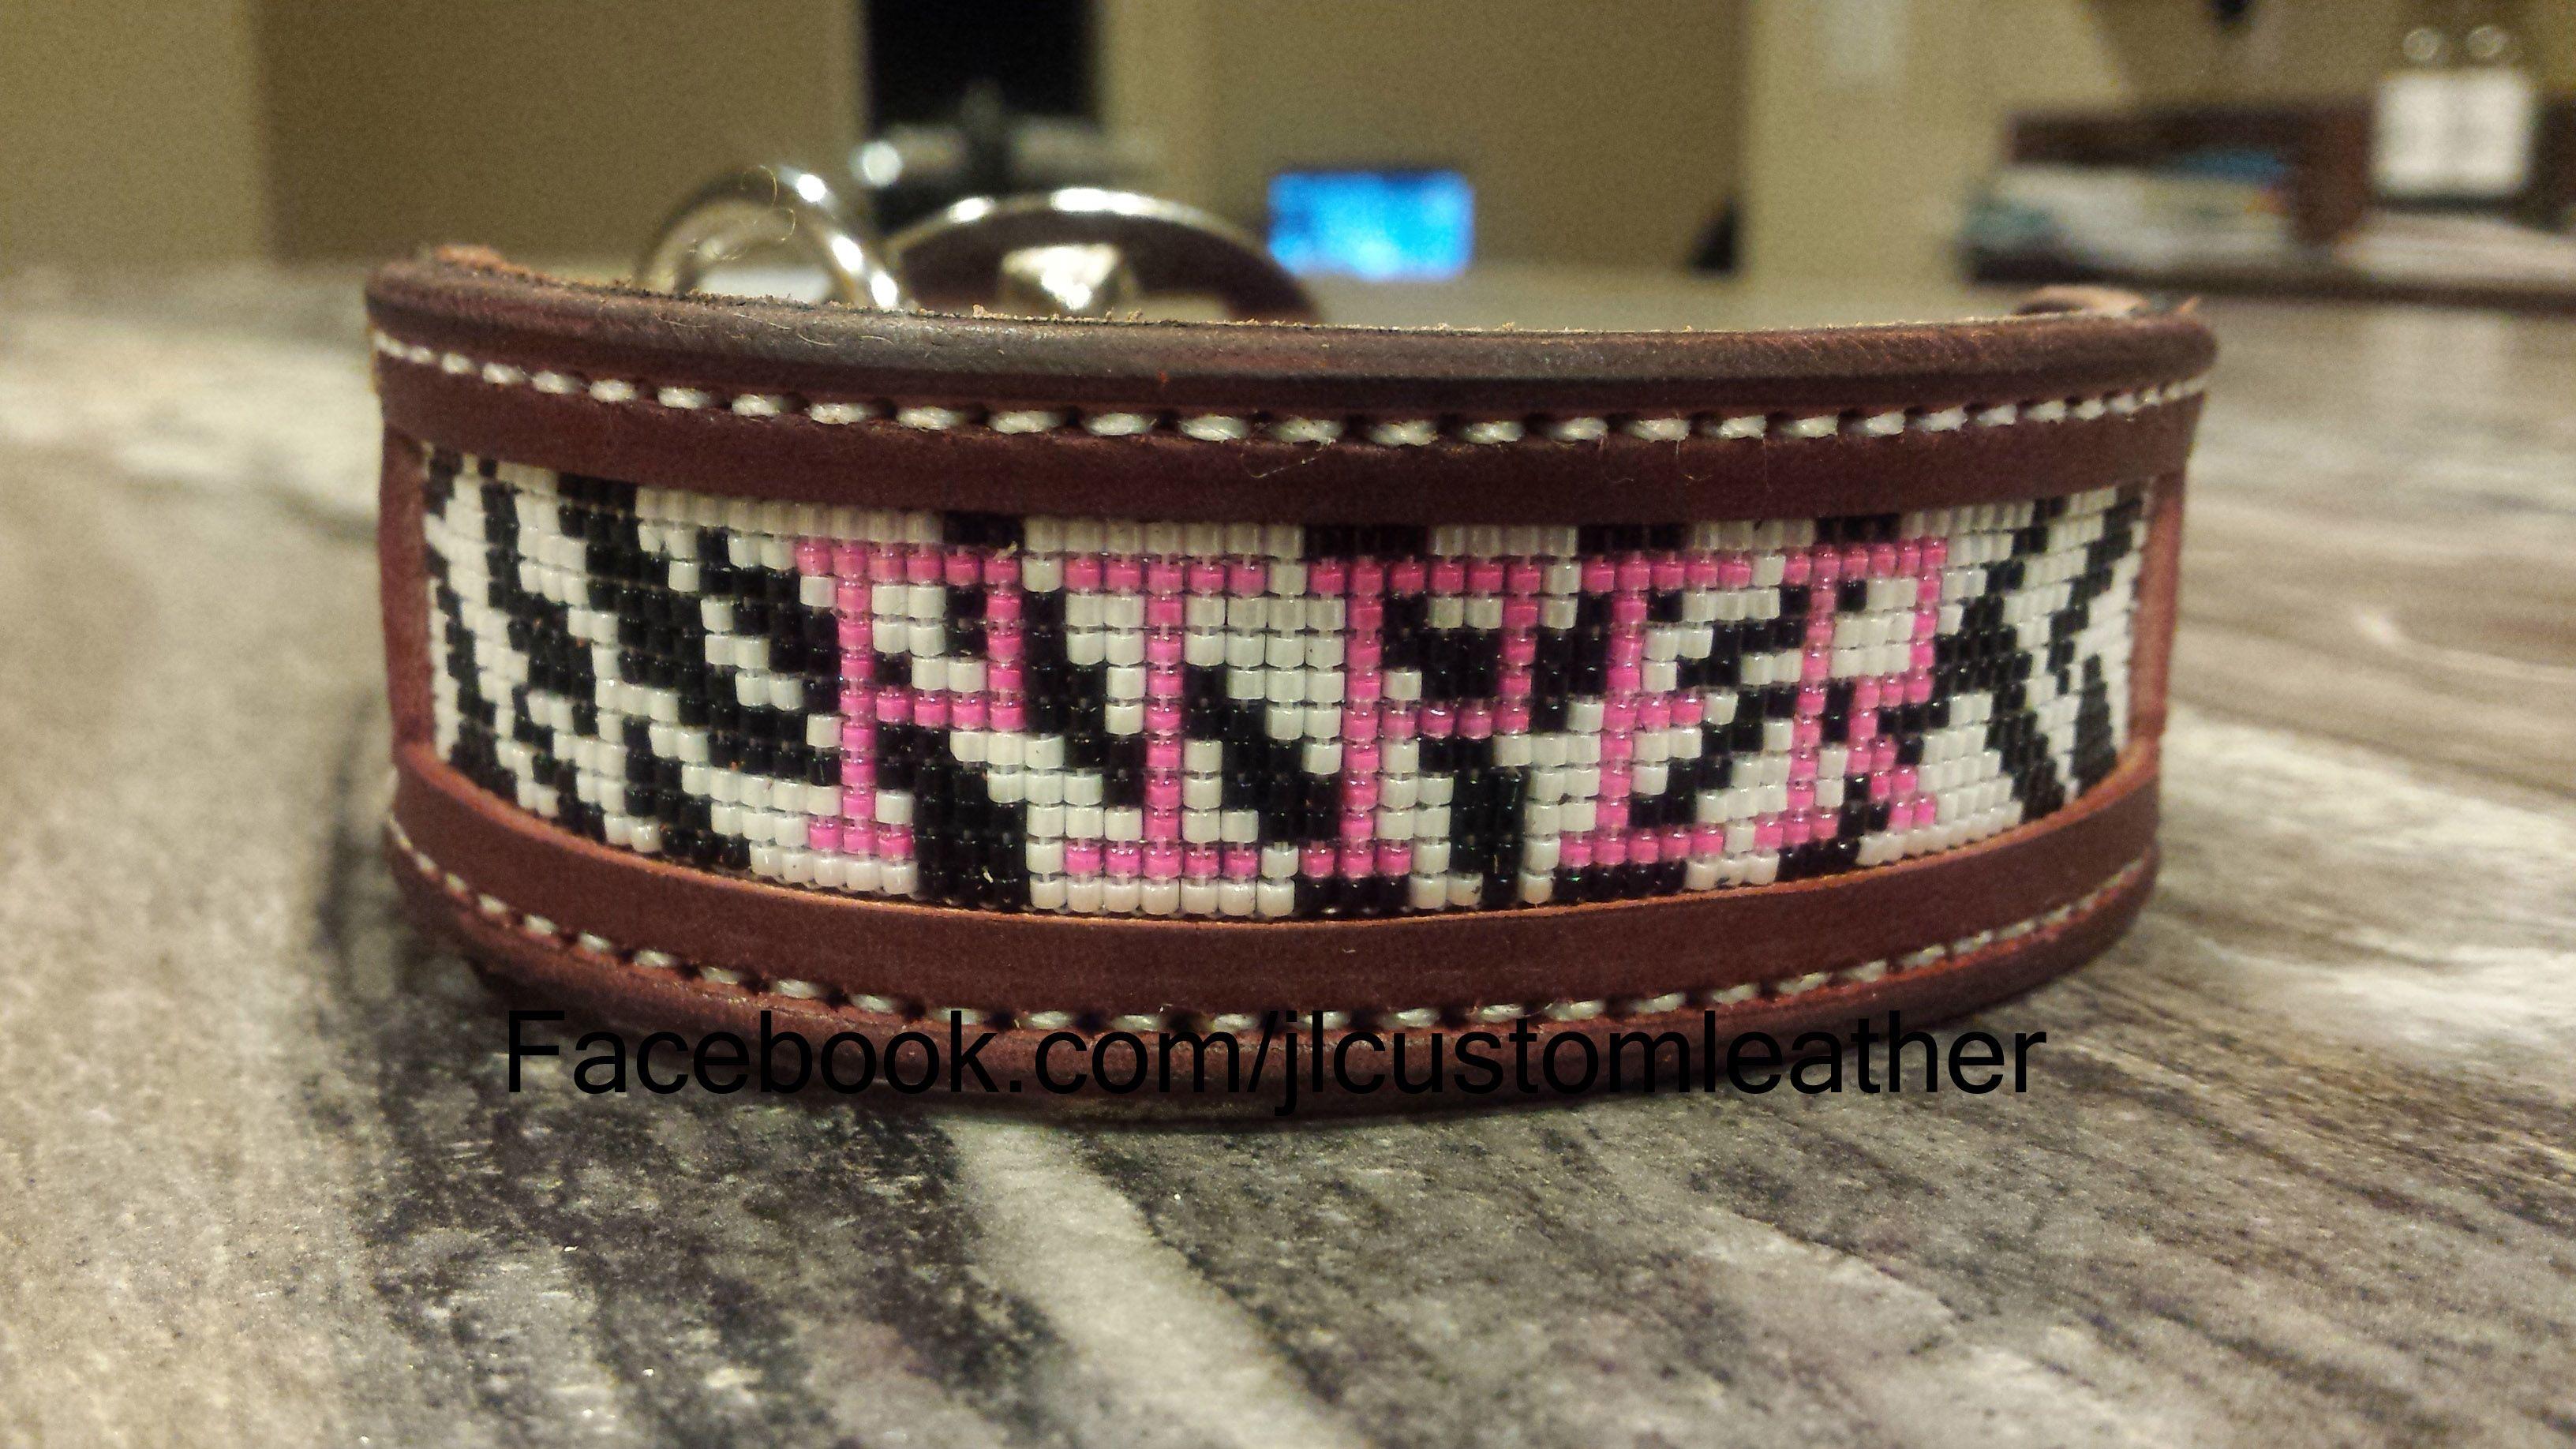 Custom Beaded dog collars $65  Facebook.com/jlcustomleather